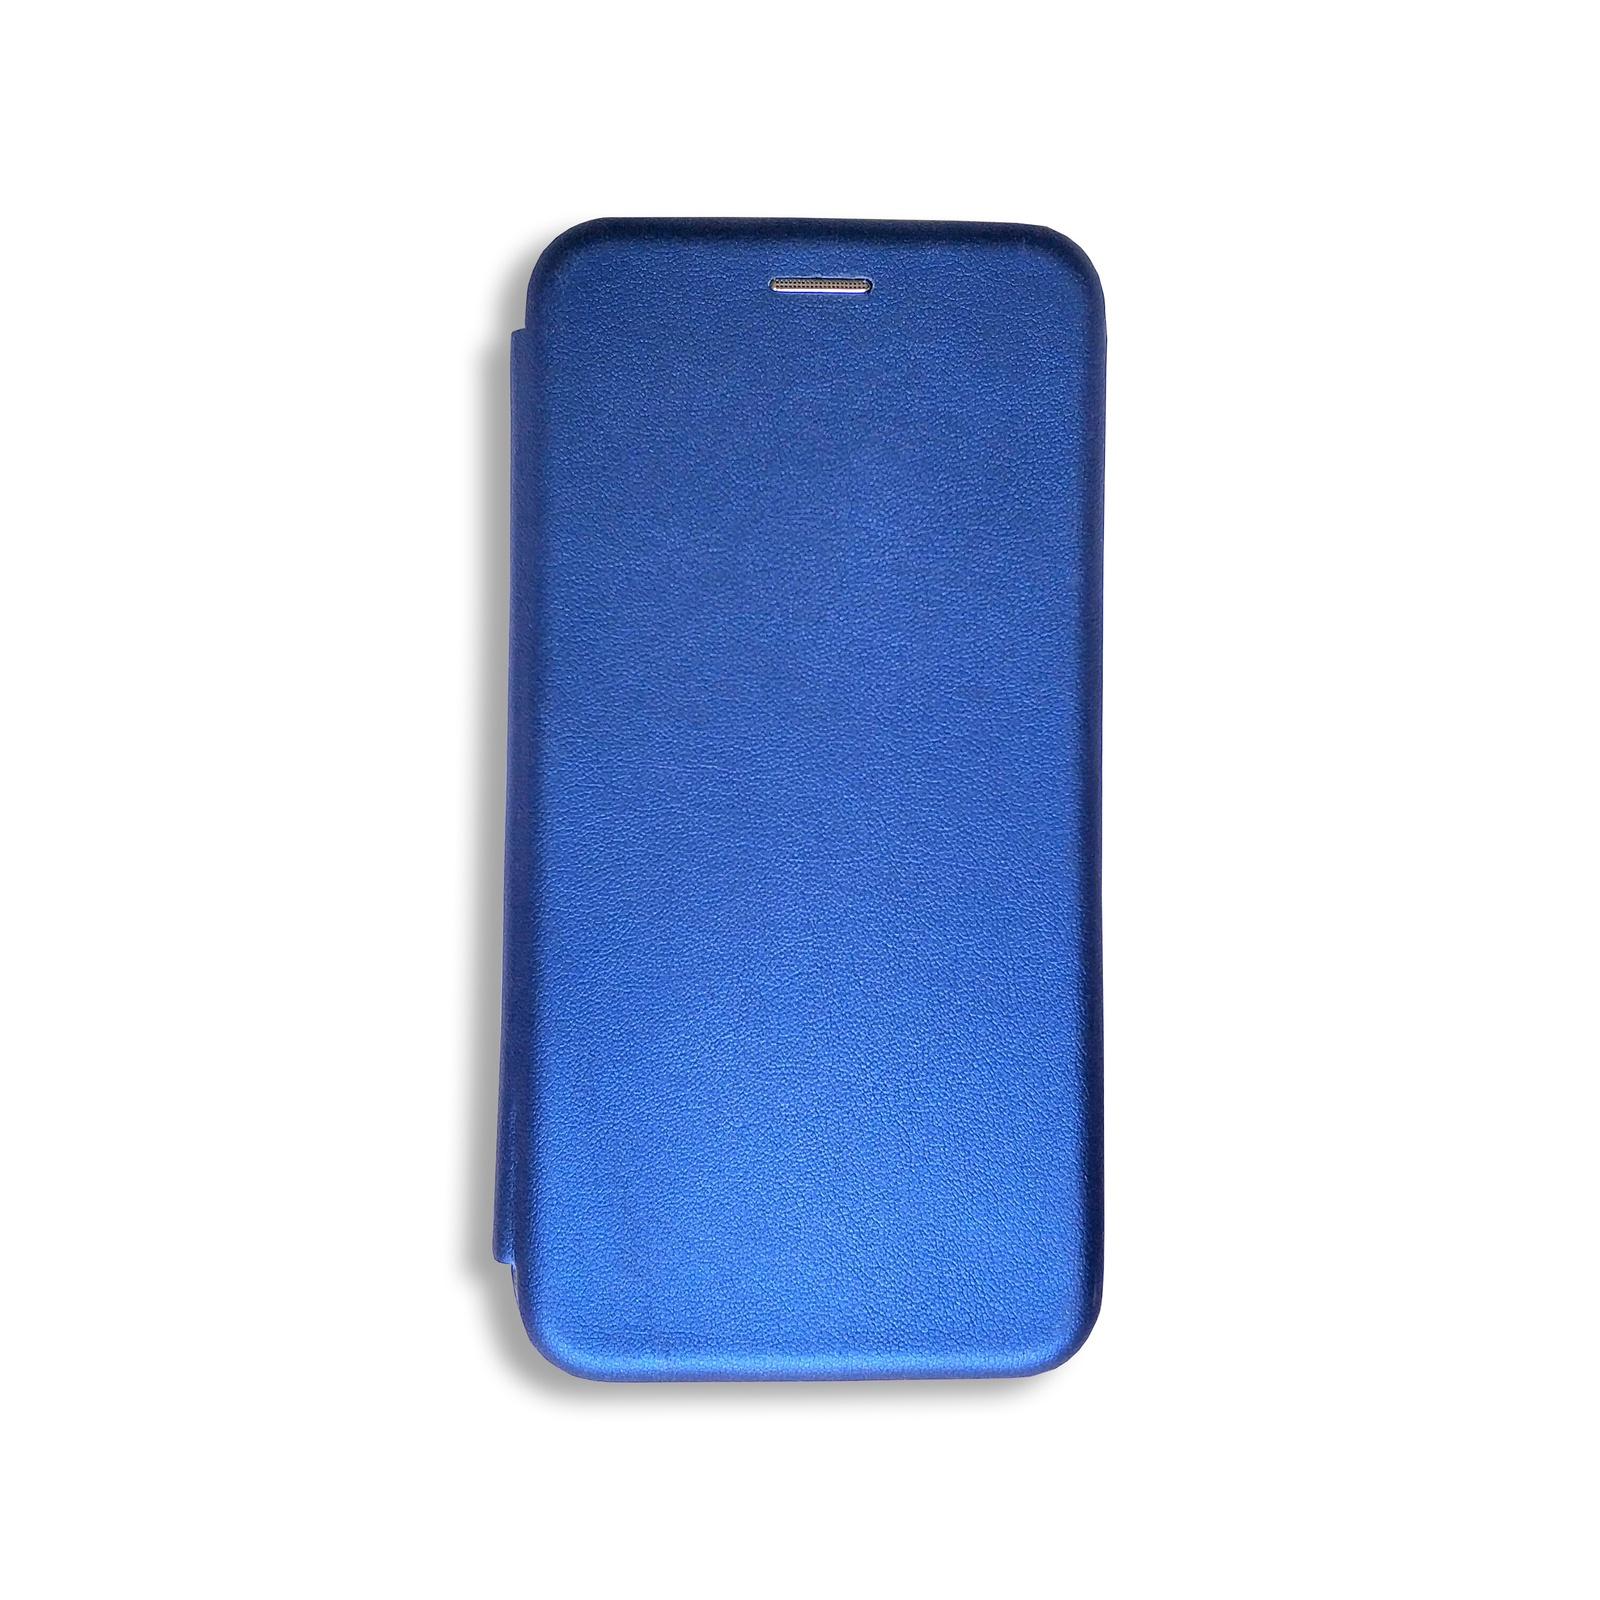 Чехол для сотового телефона книжка для Samsung Galaxy J6+ (2018), синий